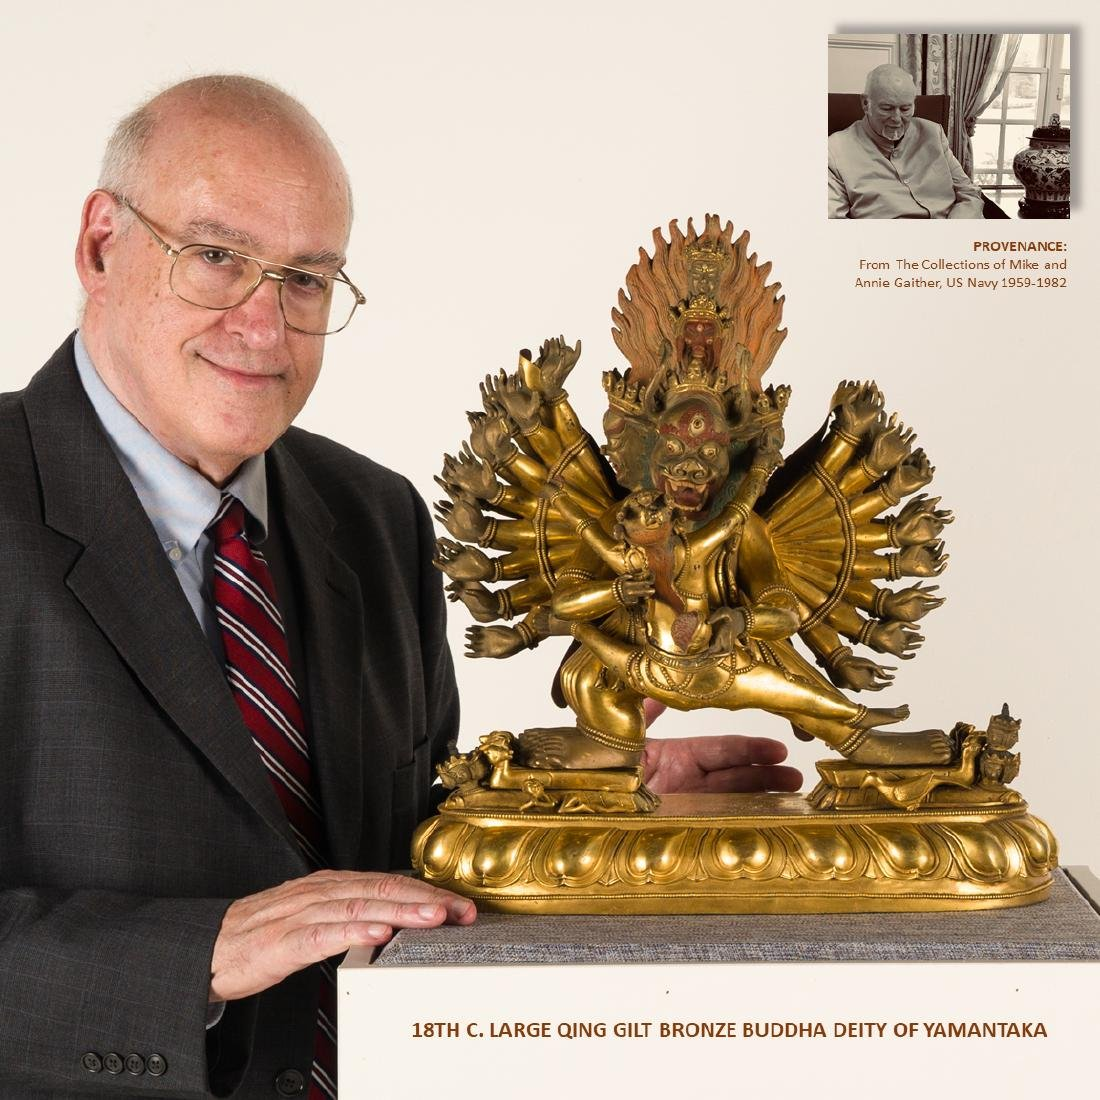 18TH C LARGE QING GILT BRONZE BUDDHA DEITY YAMANTAKA